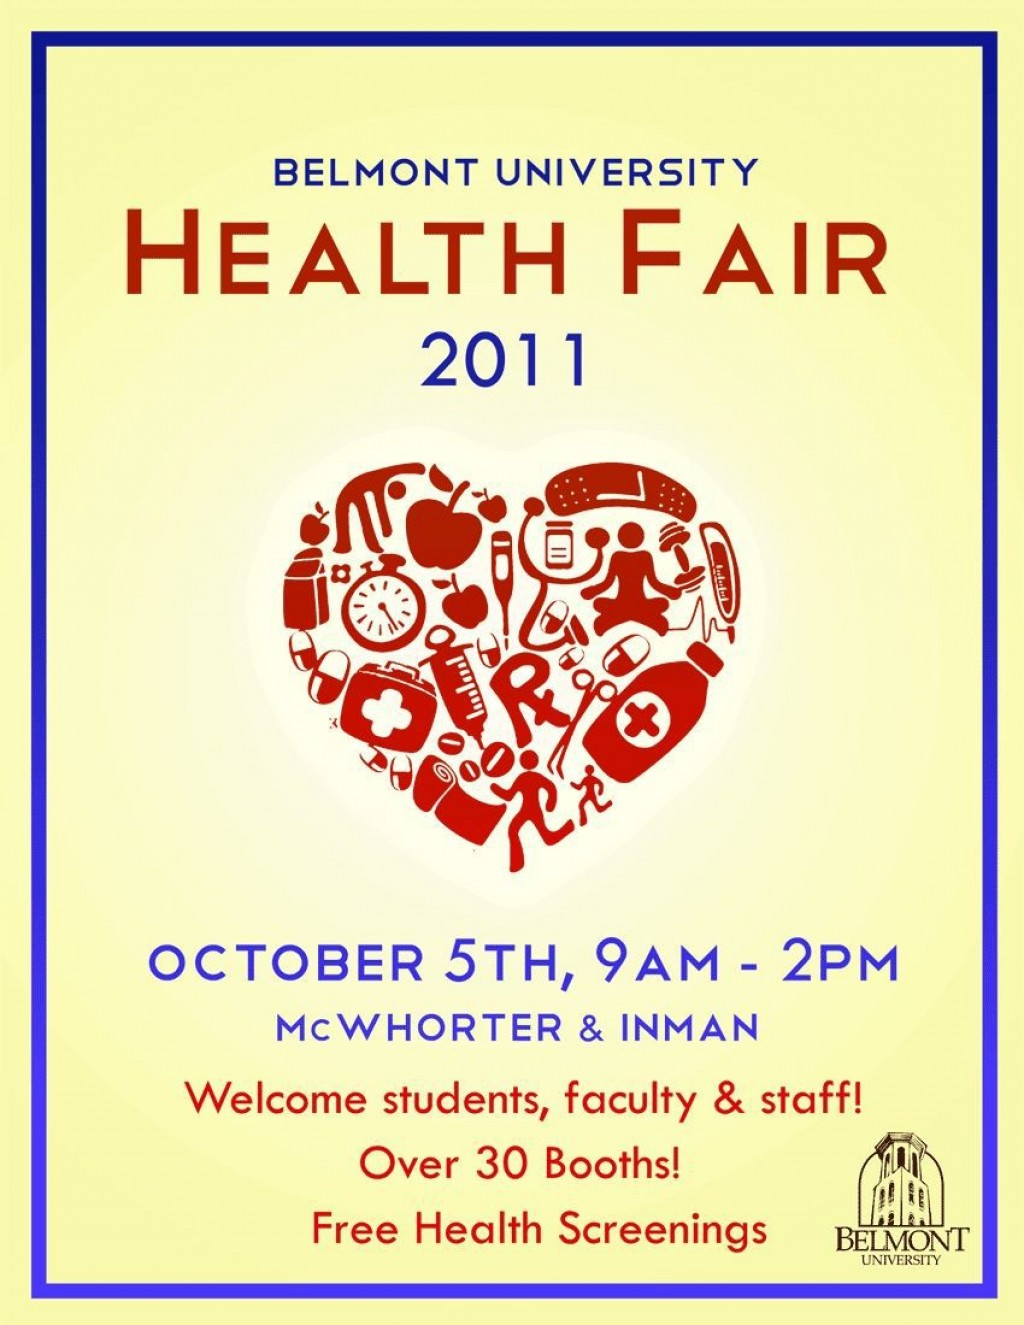 004 Wonderful Health Fair Flyer Template Free Design  DownloadLarge